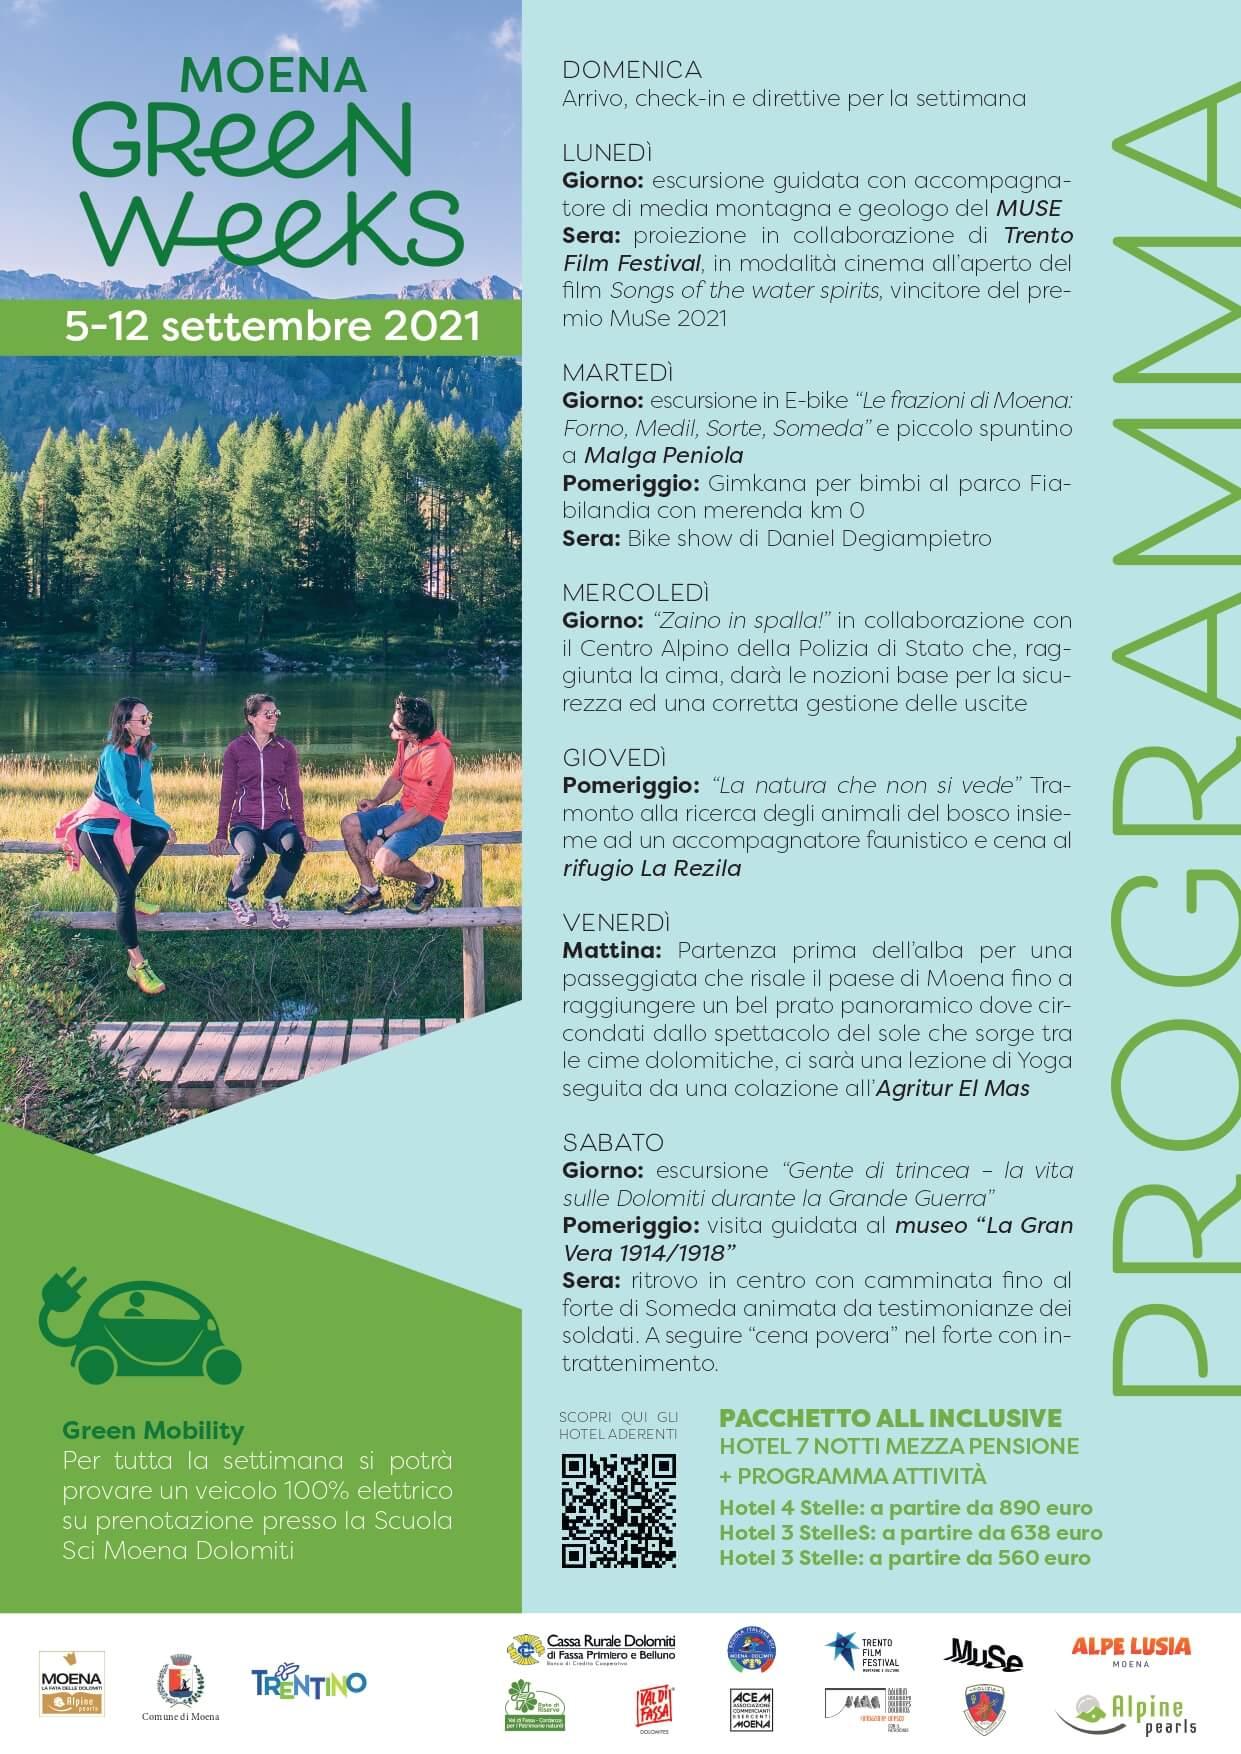 Moena Green Week settembre 2021